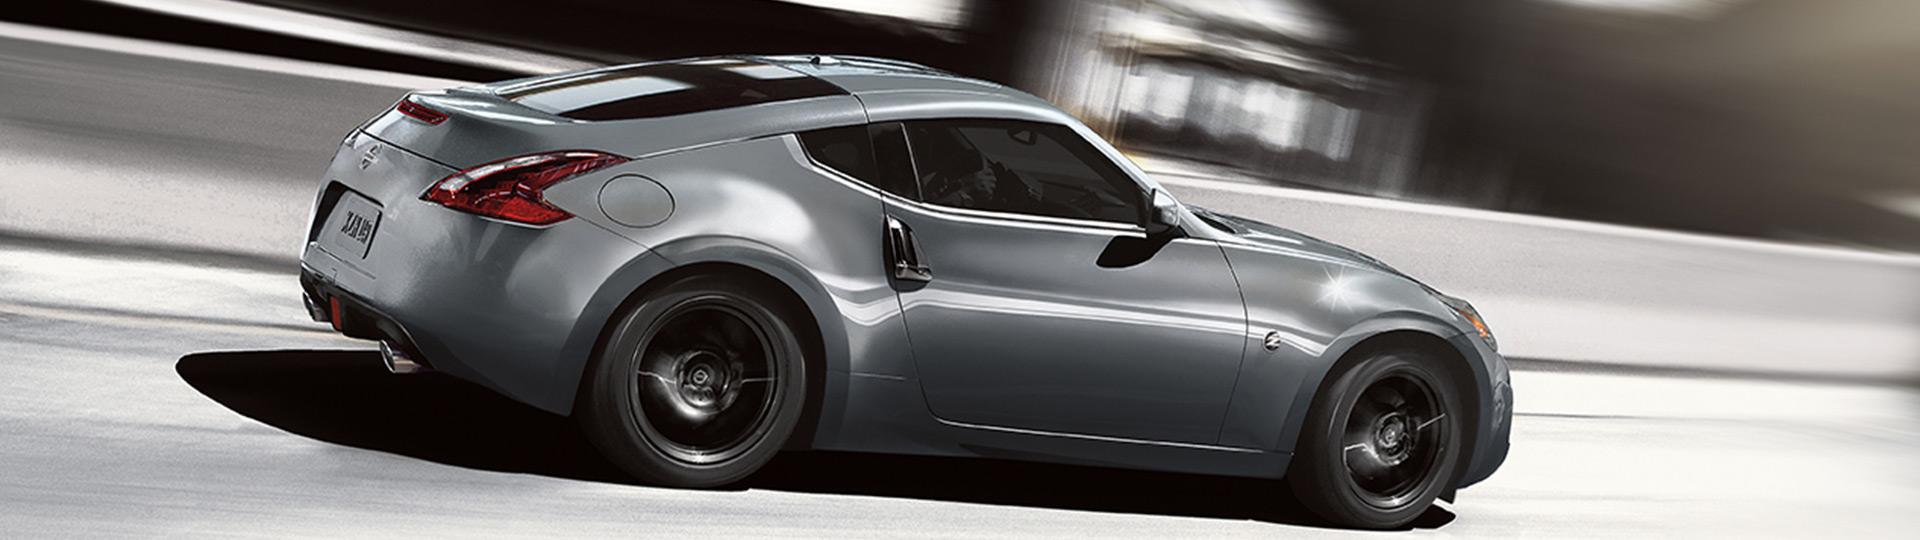 z370-coupe-zapas